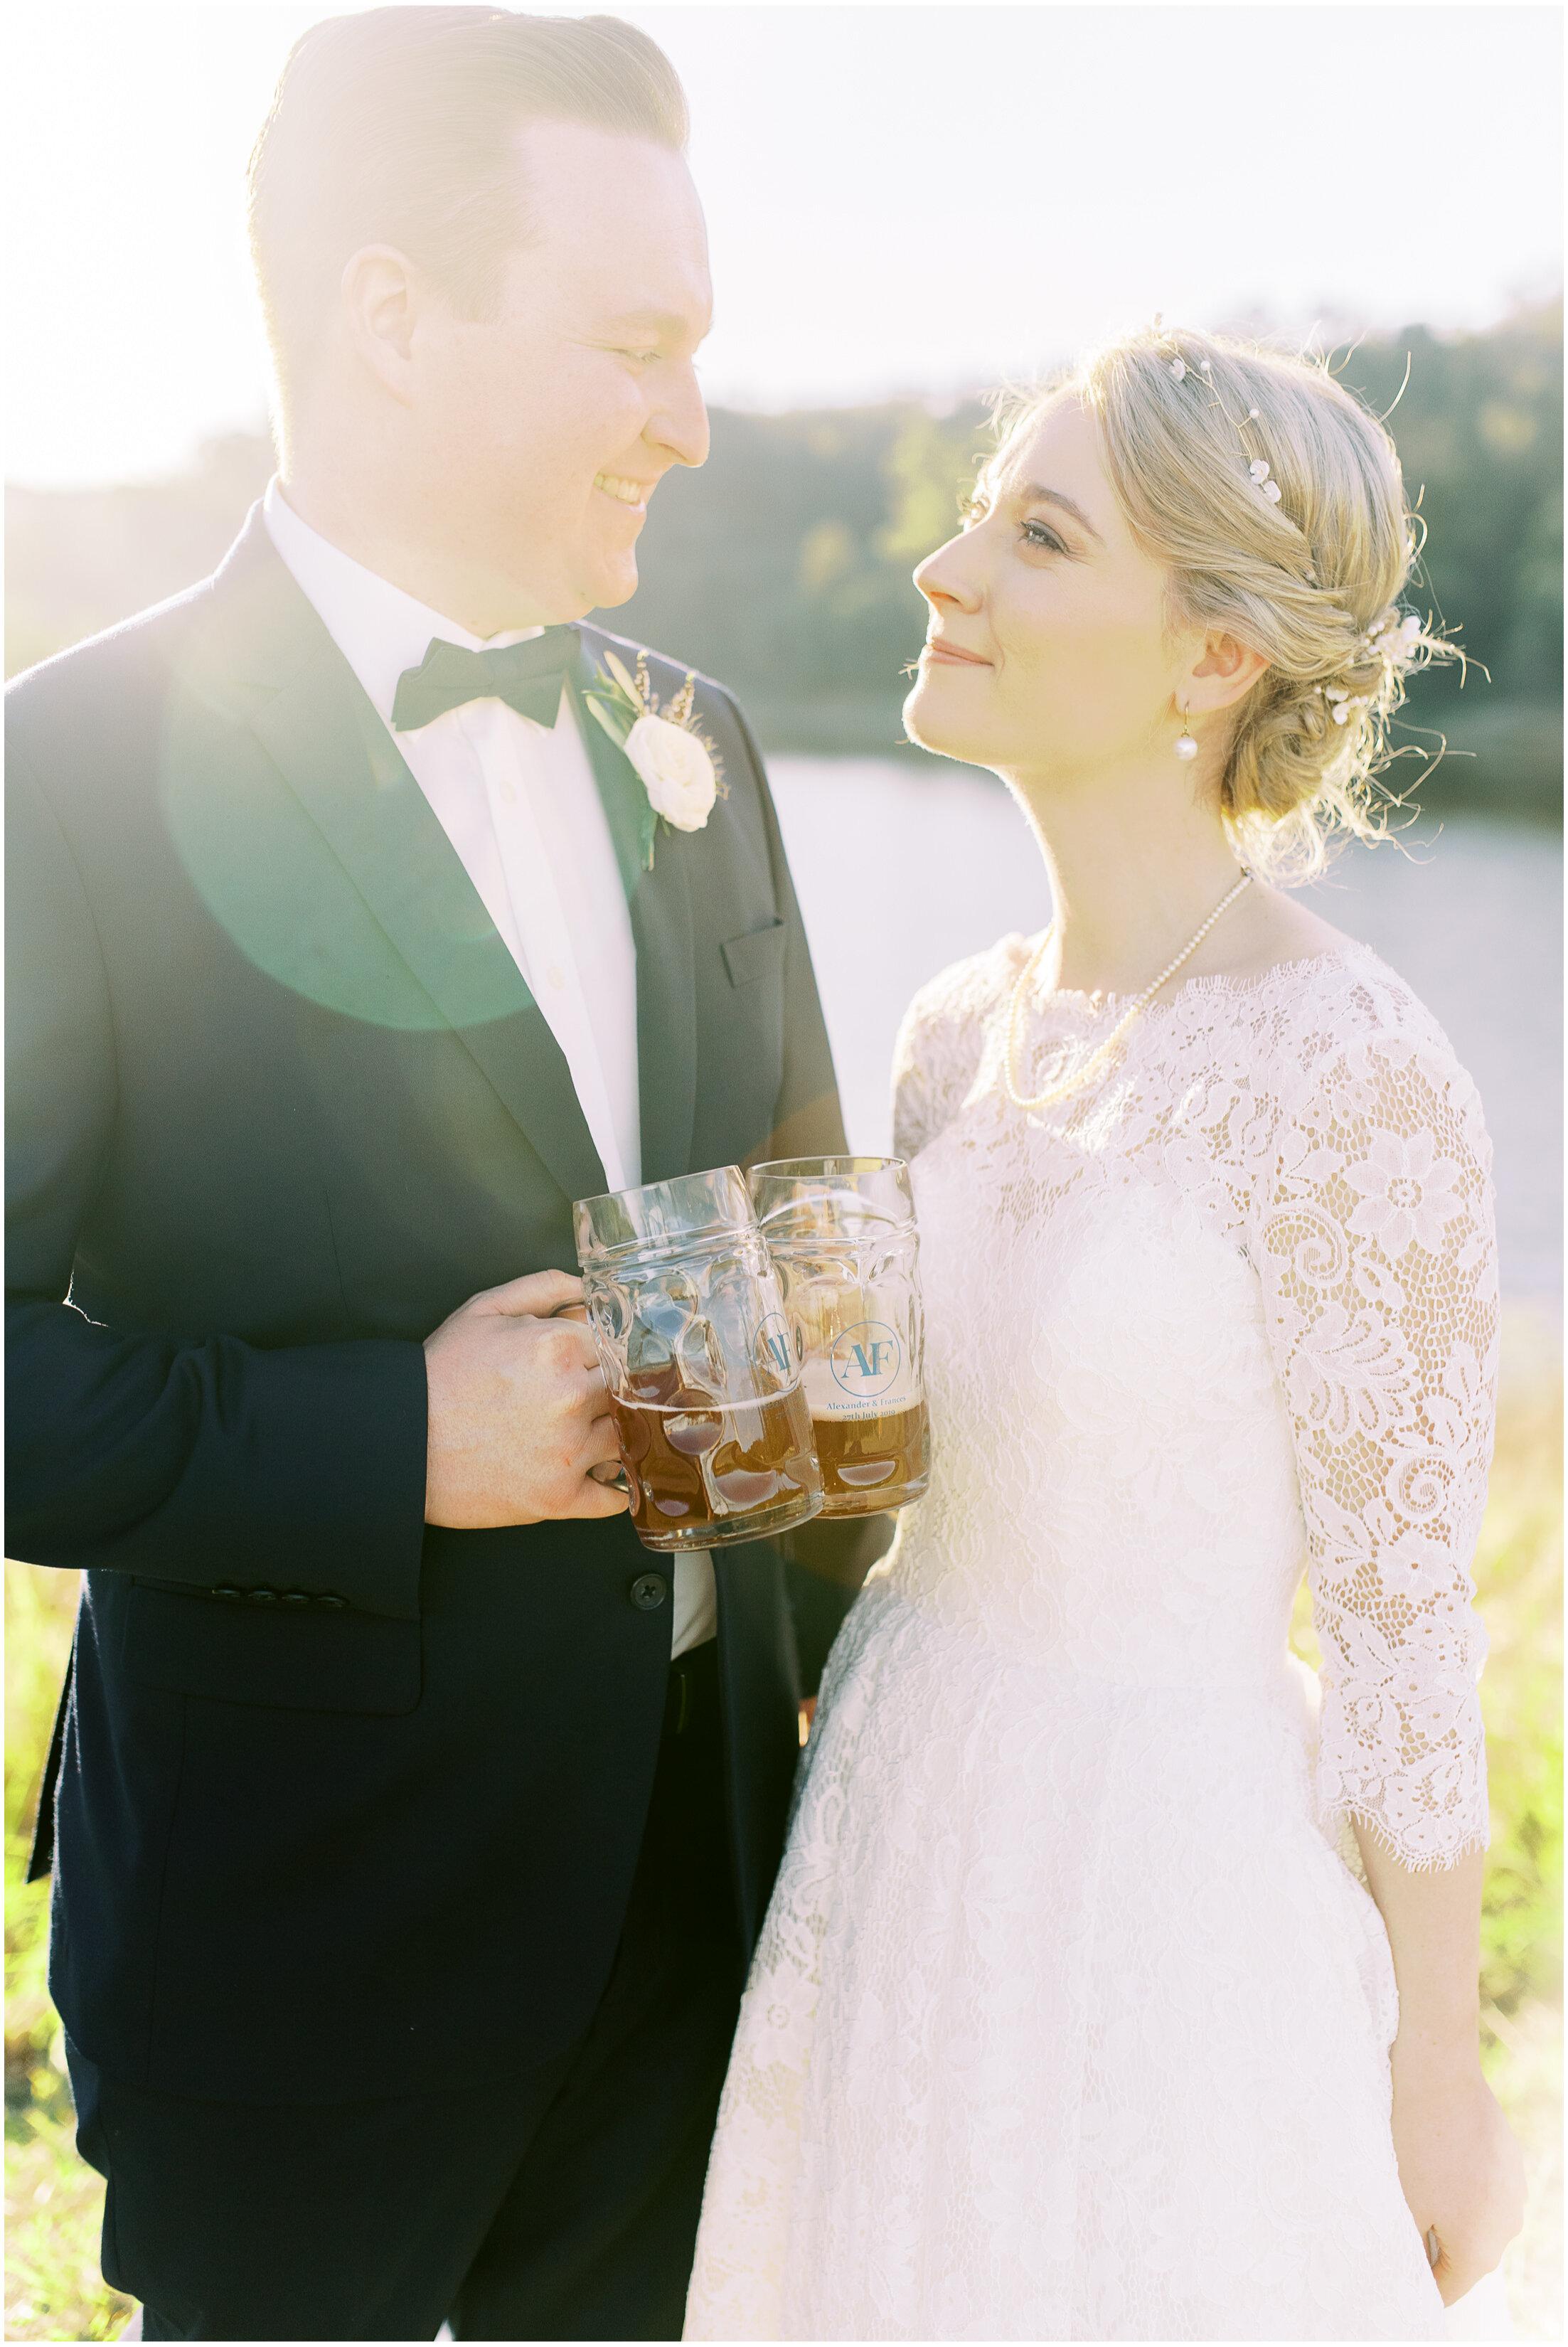 brisbane-fine-art-wedding-photographer-lauren-olivia-luxury-wedding-australia-27.jpg